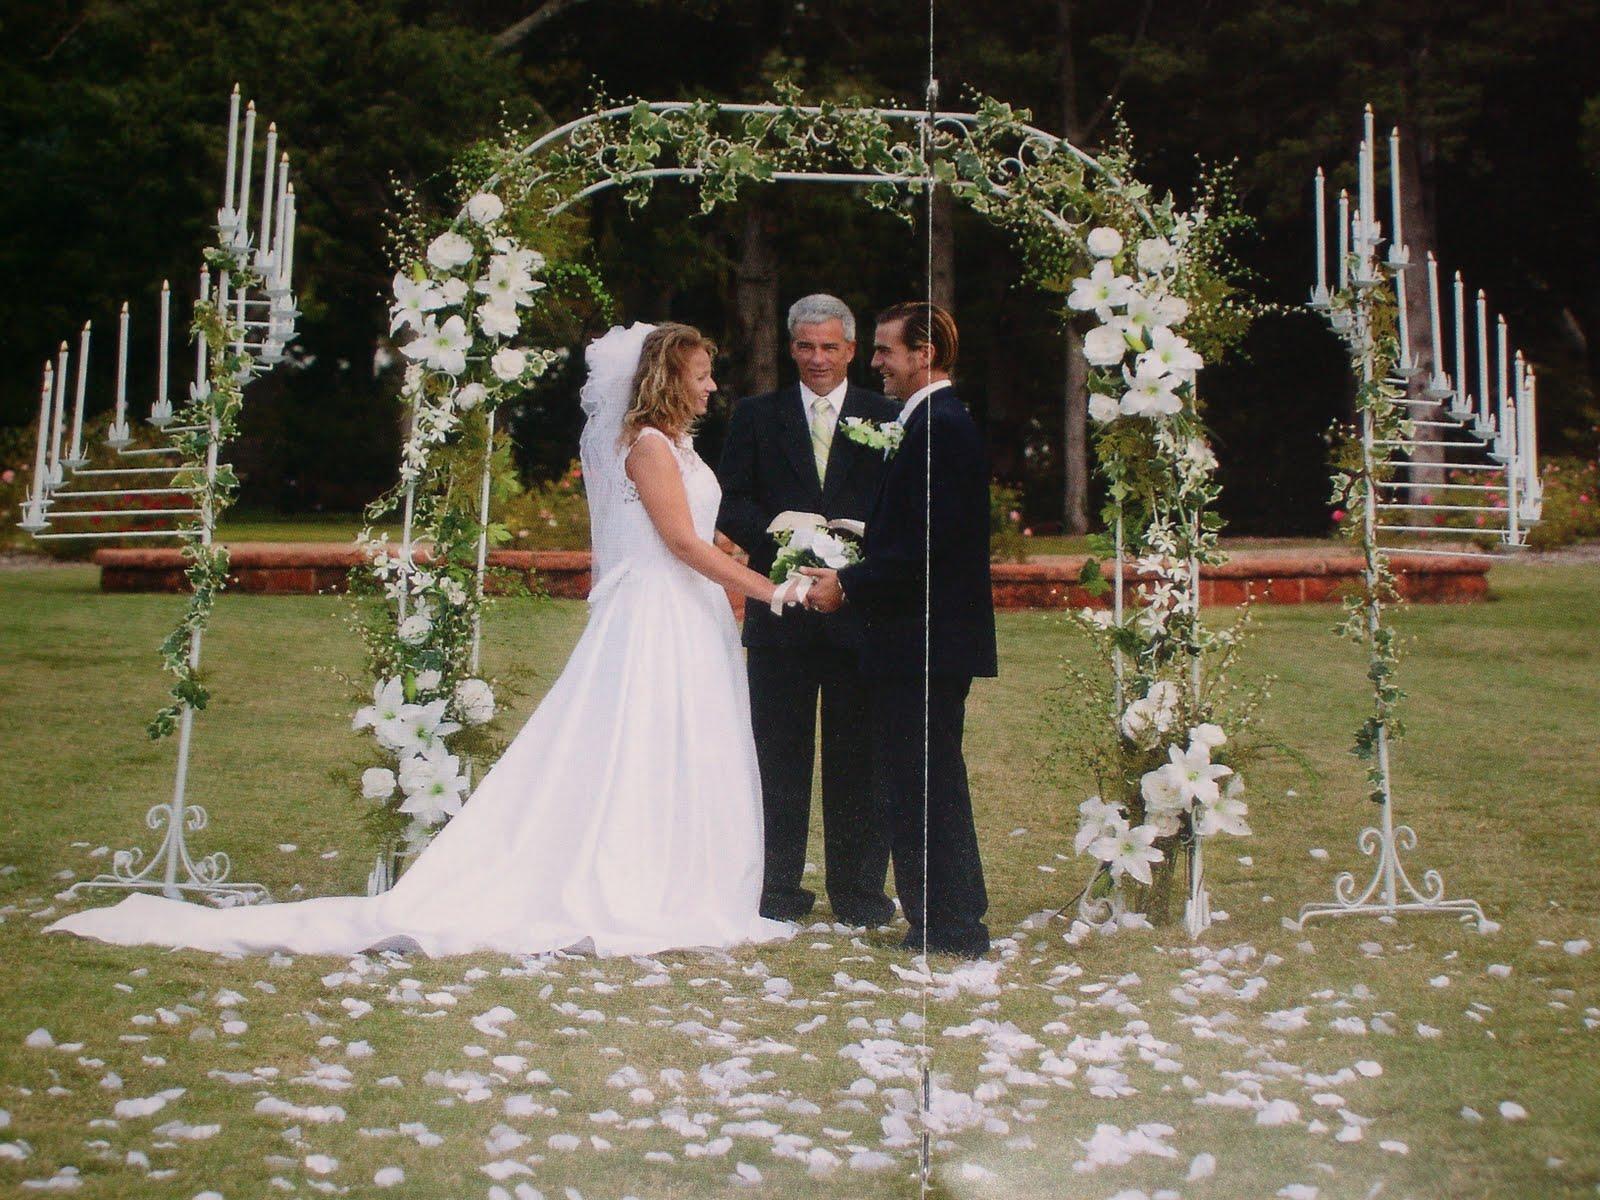 Phénix Wedding And Events Planners: Summer Weddings...an